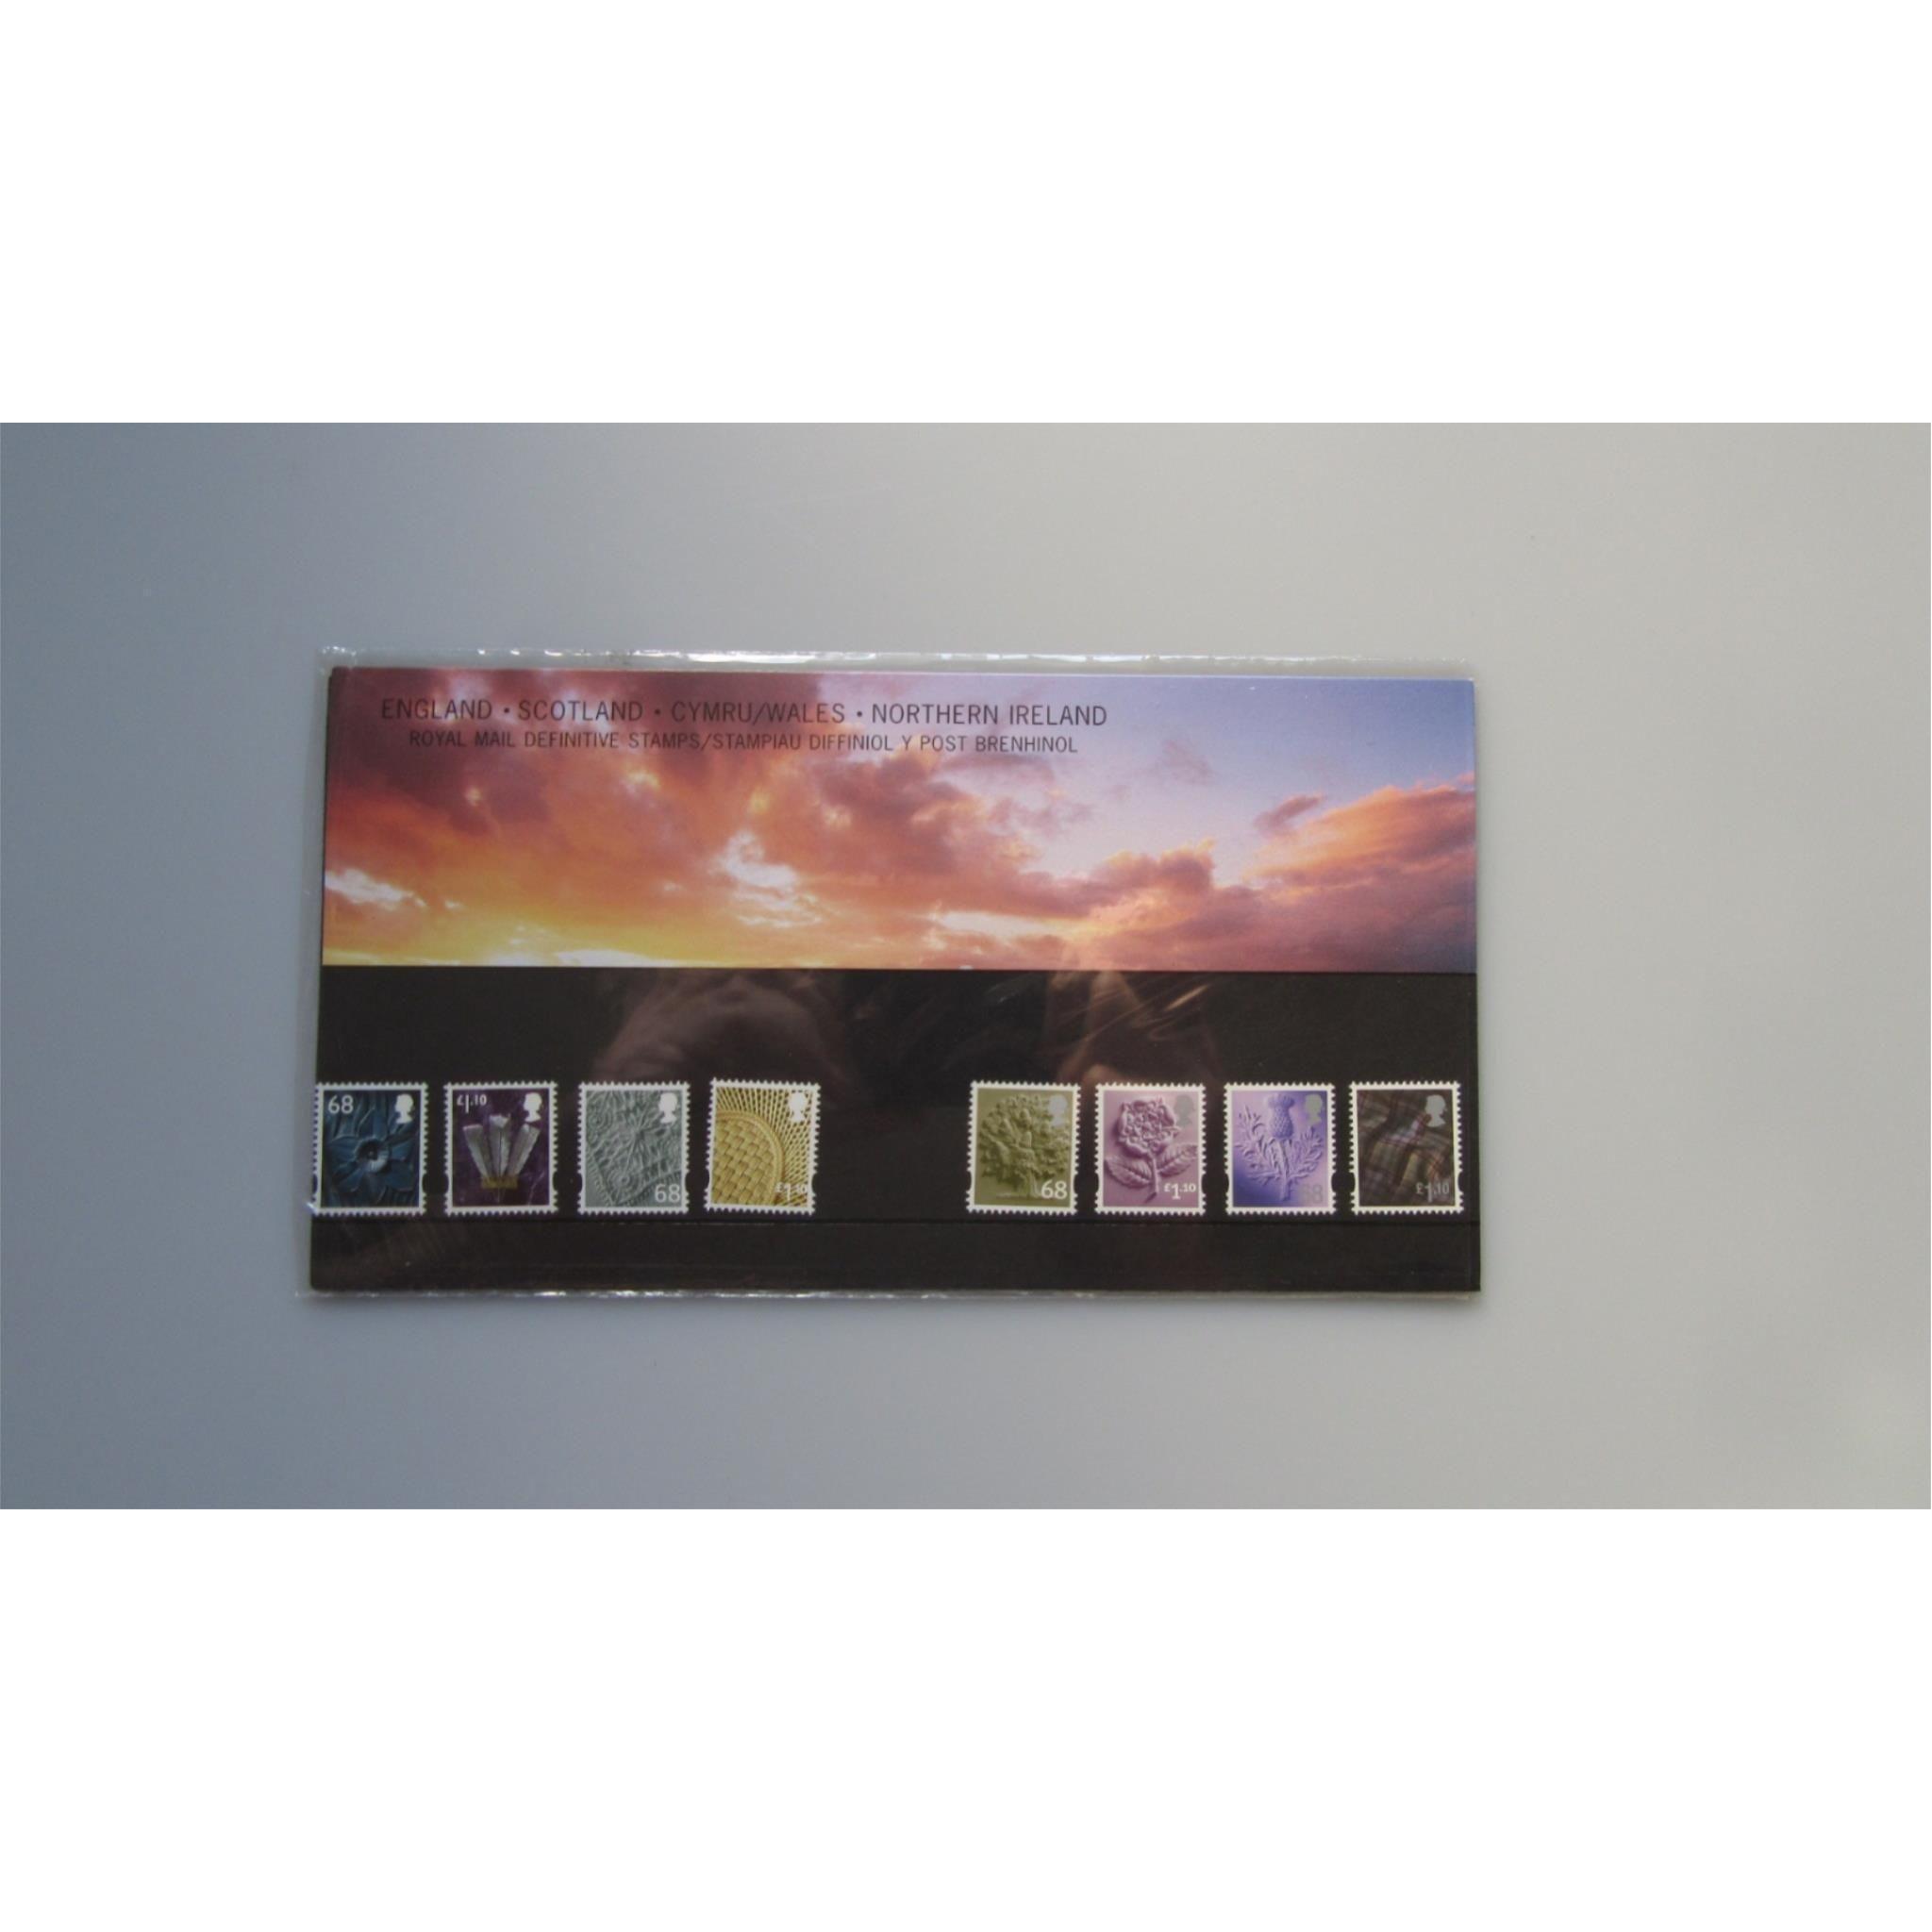 2011 gb presentation pack royal mail definitive stamps